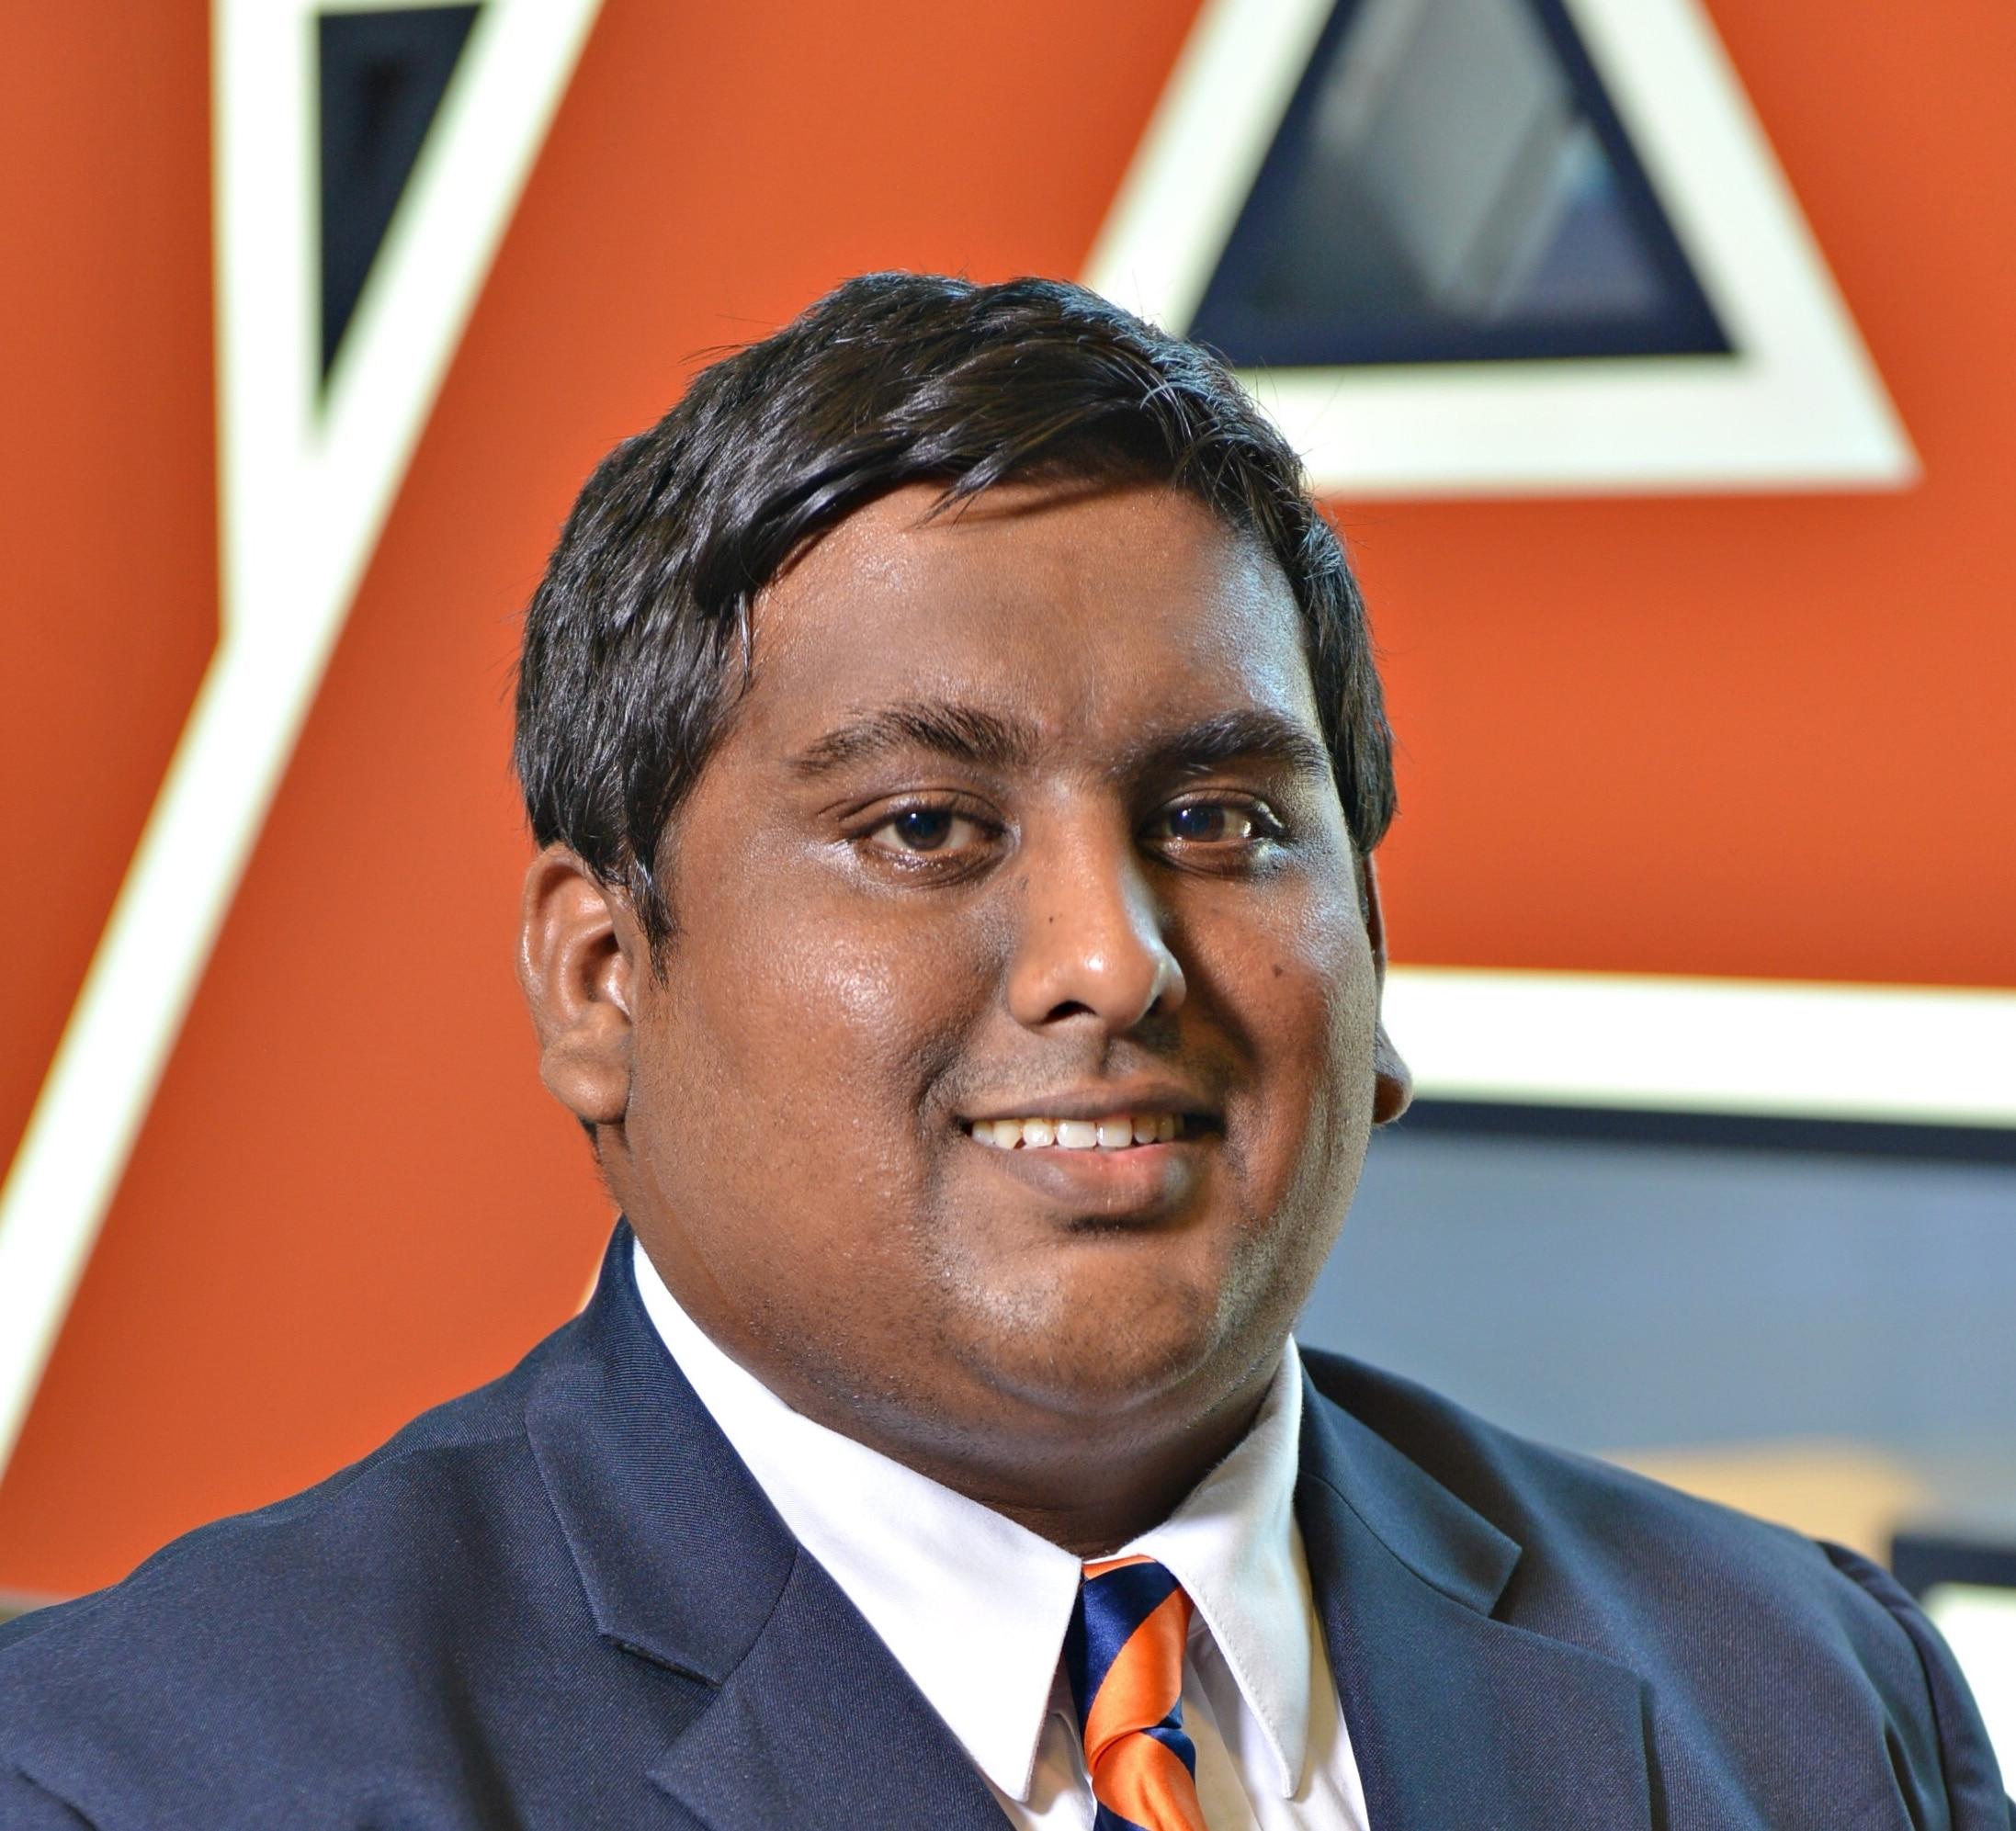 VIRAG BHARAT PATEL Financial Professional & Insurance Agent